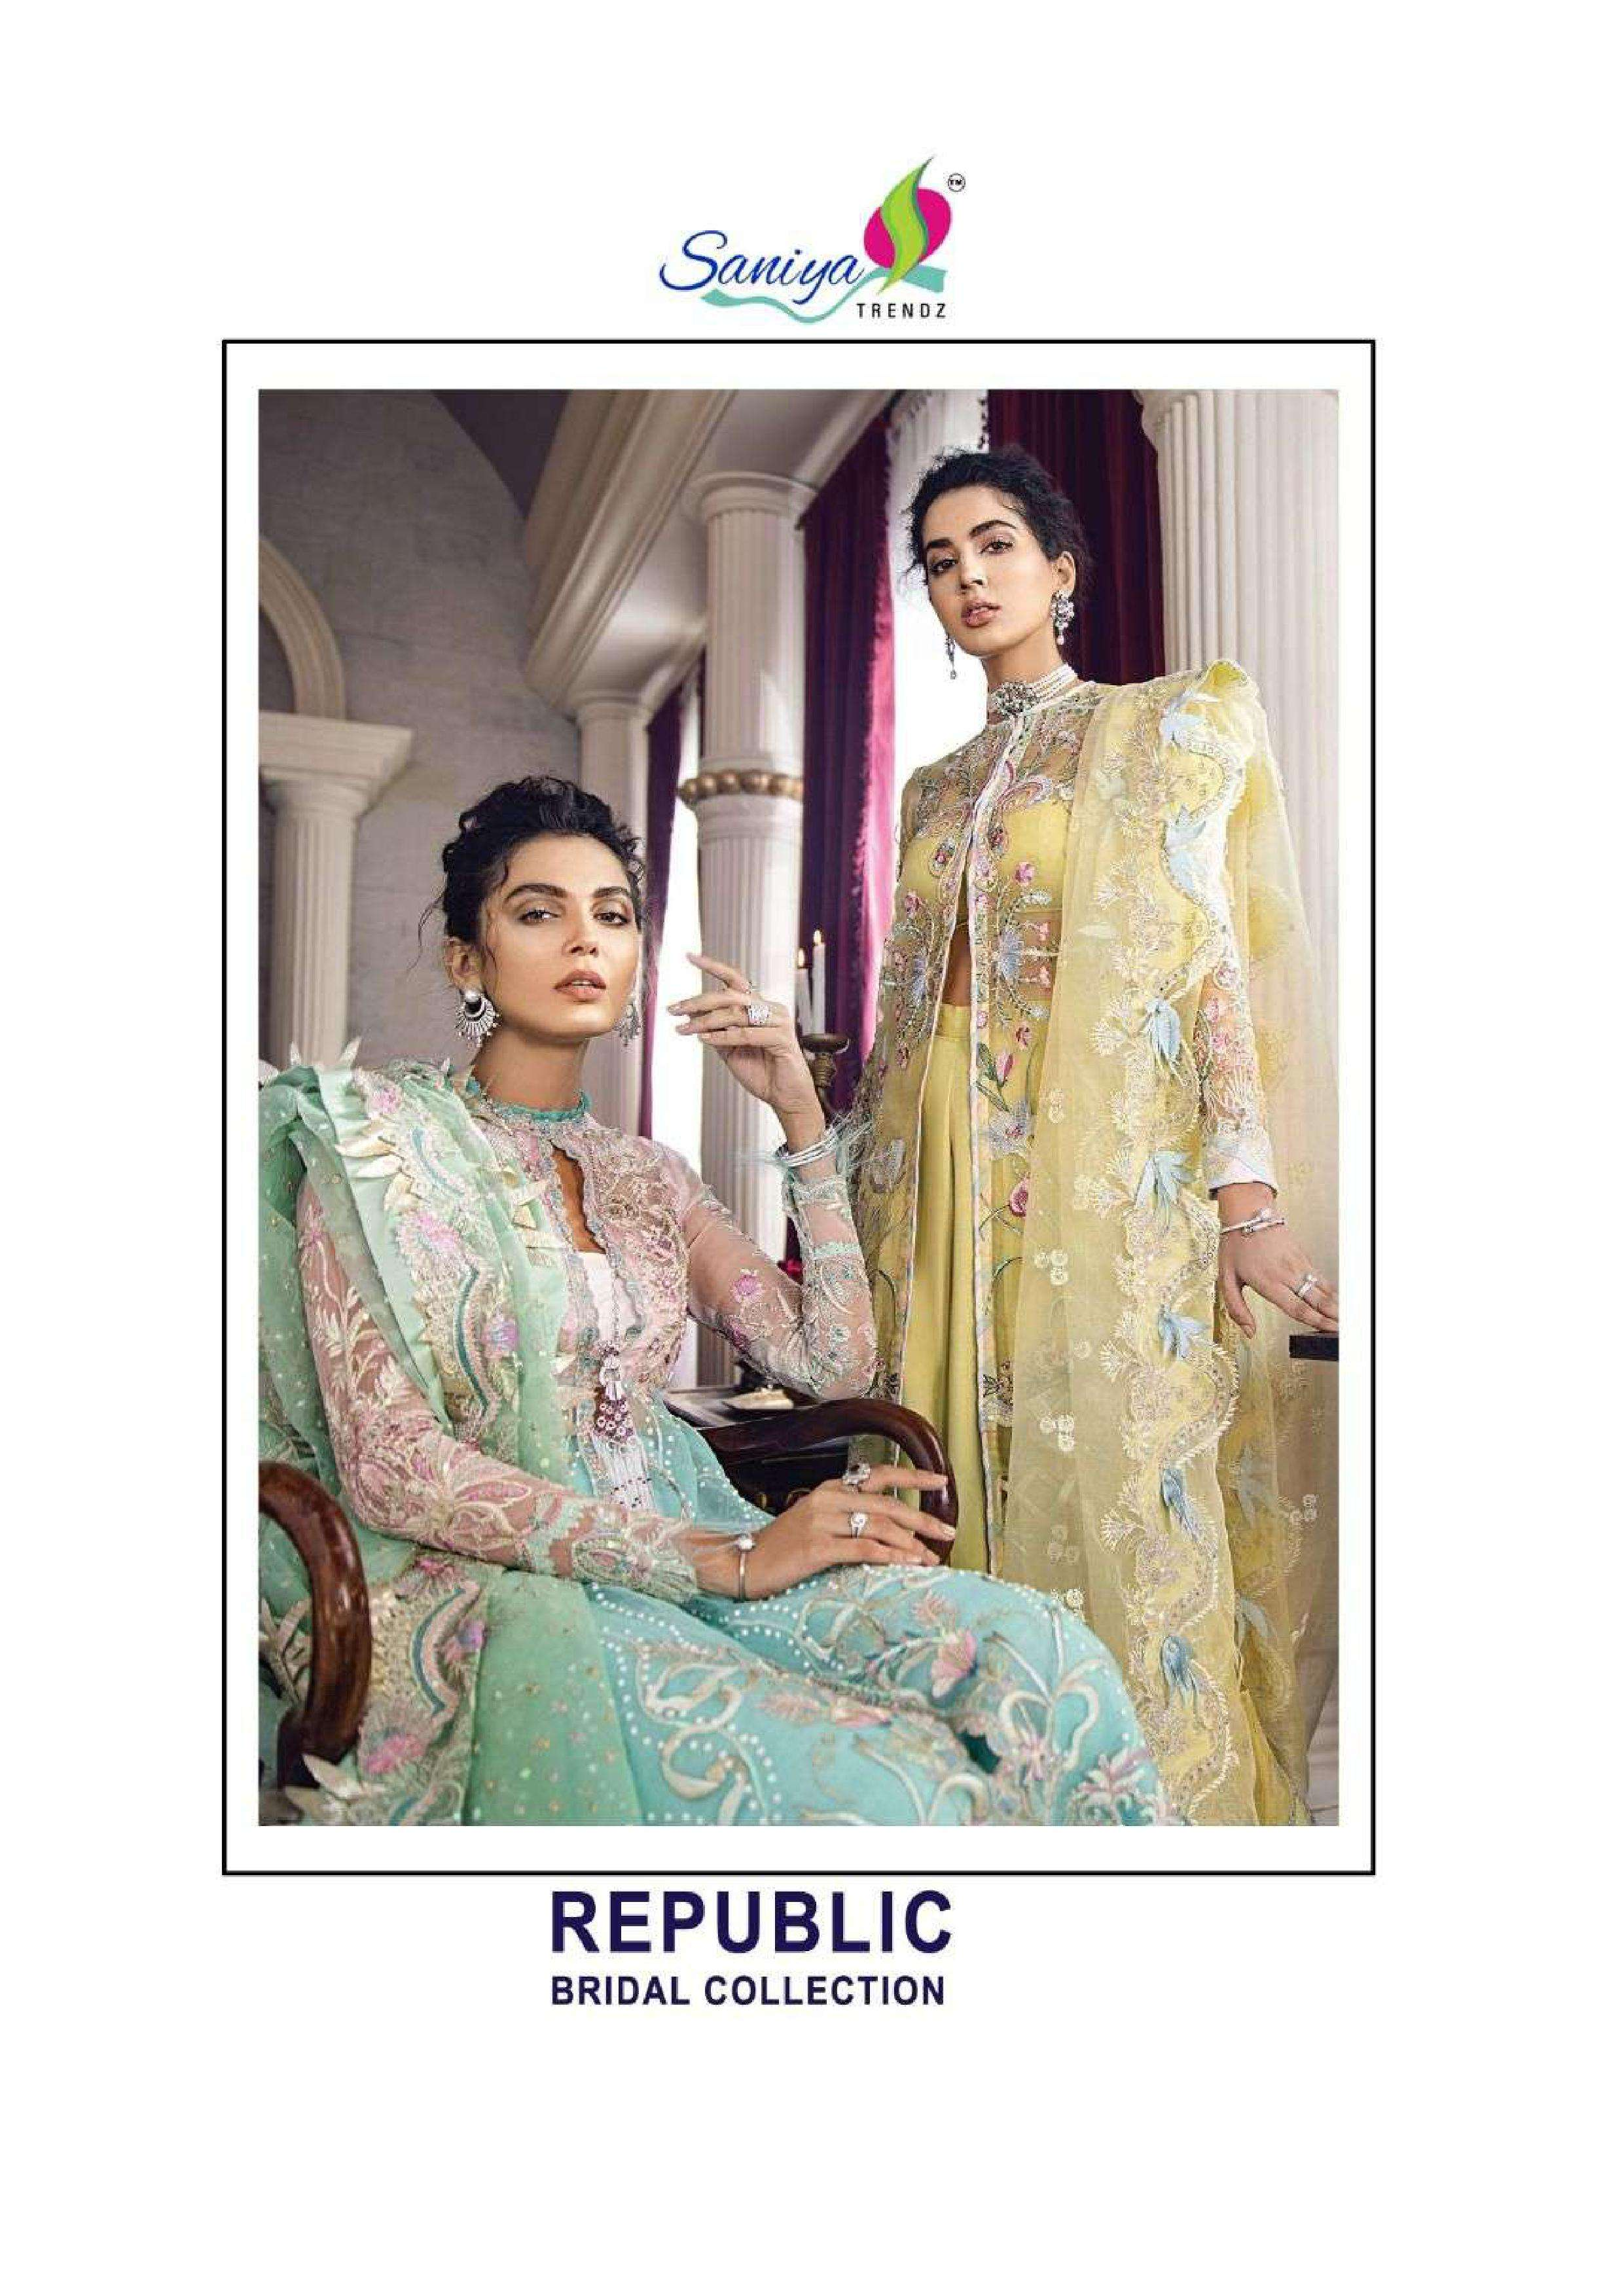 saniya trendz republic 1 series 26001-26003 butterfly net suit